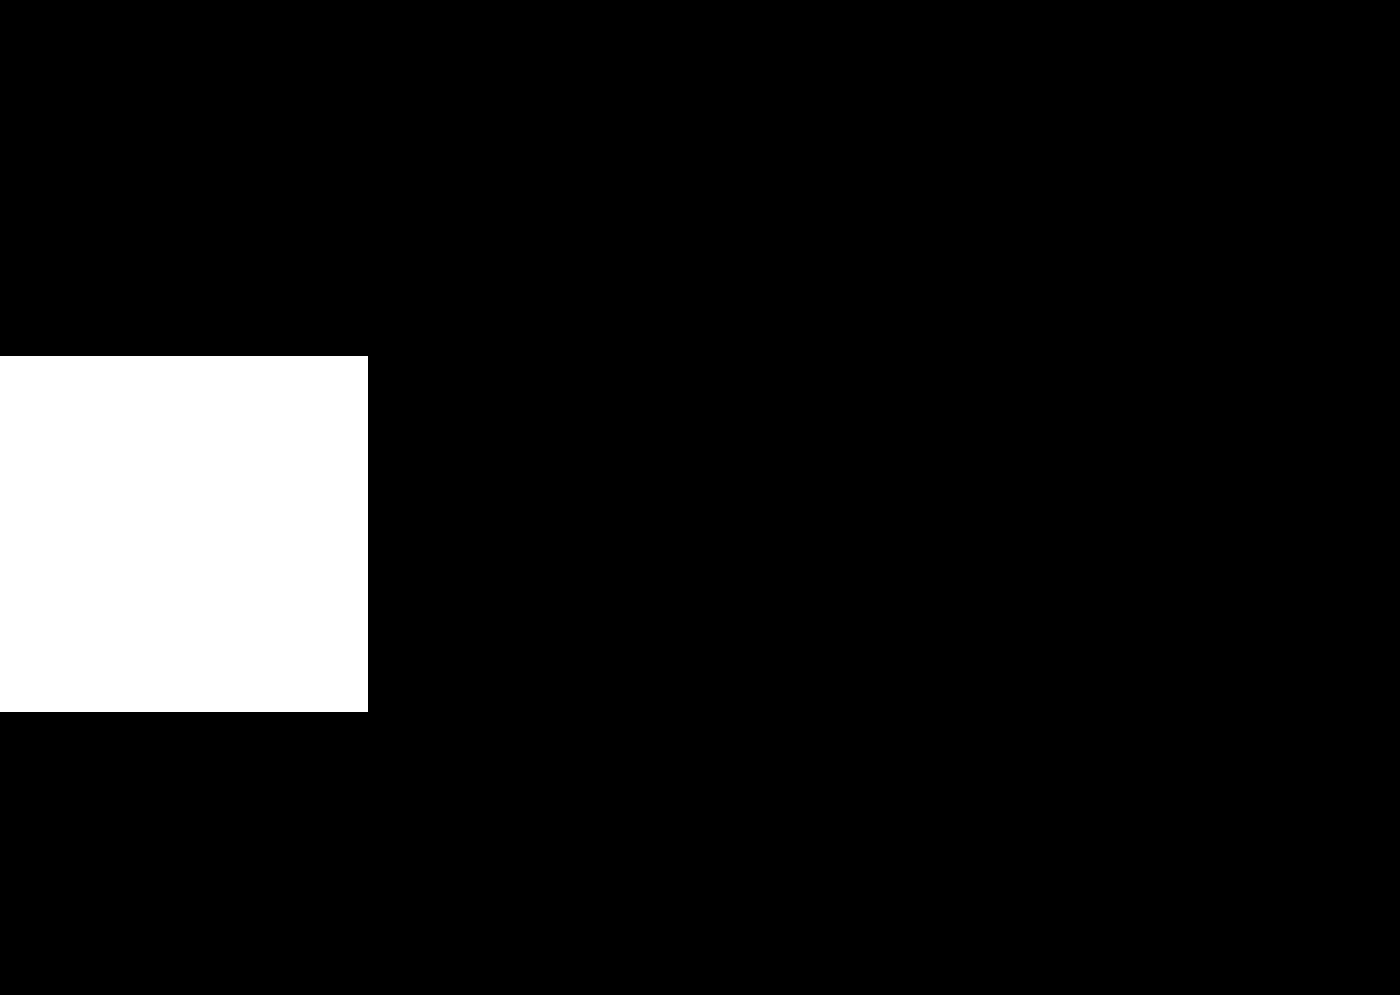 KCS logo black